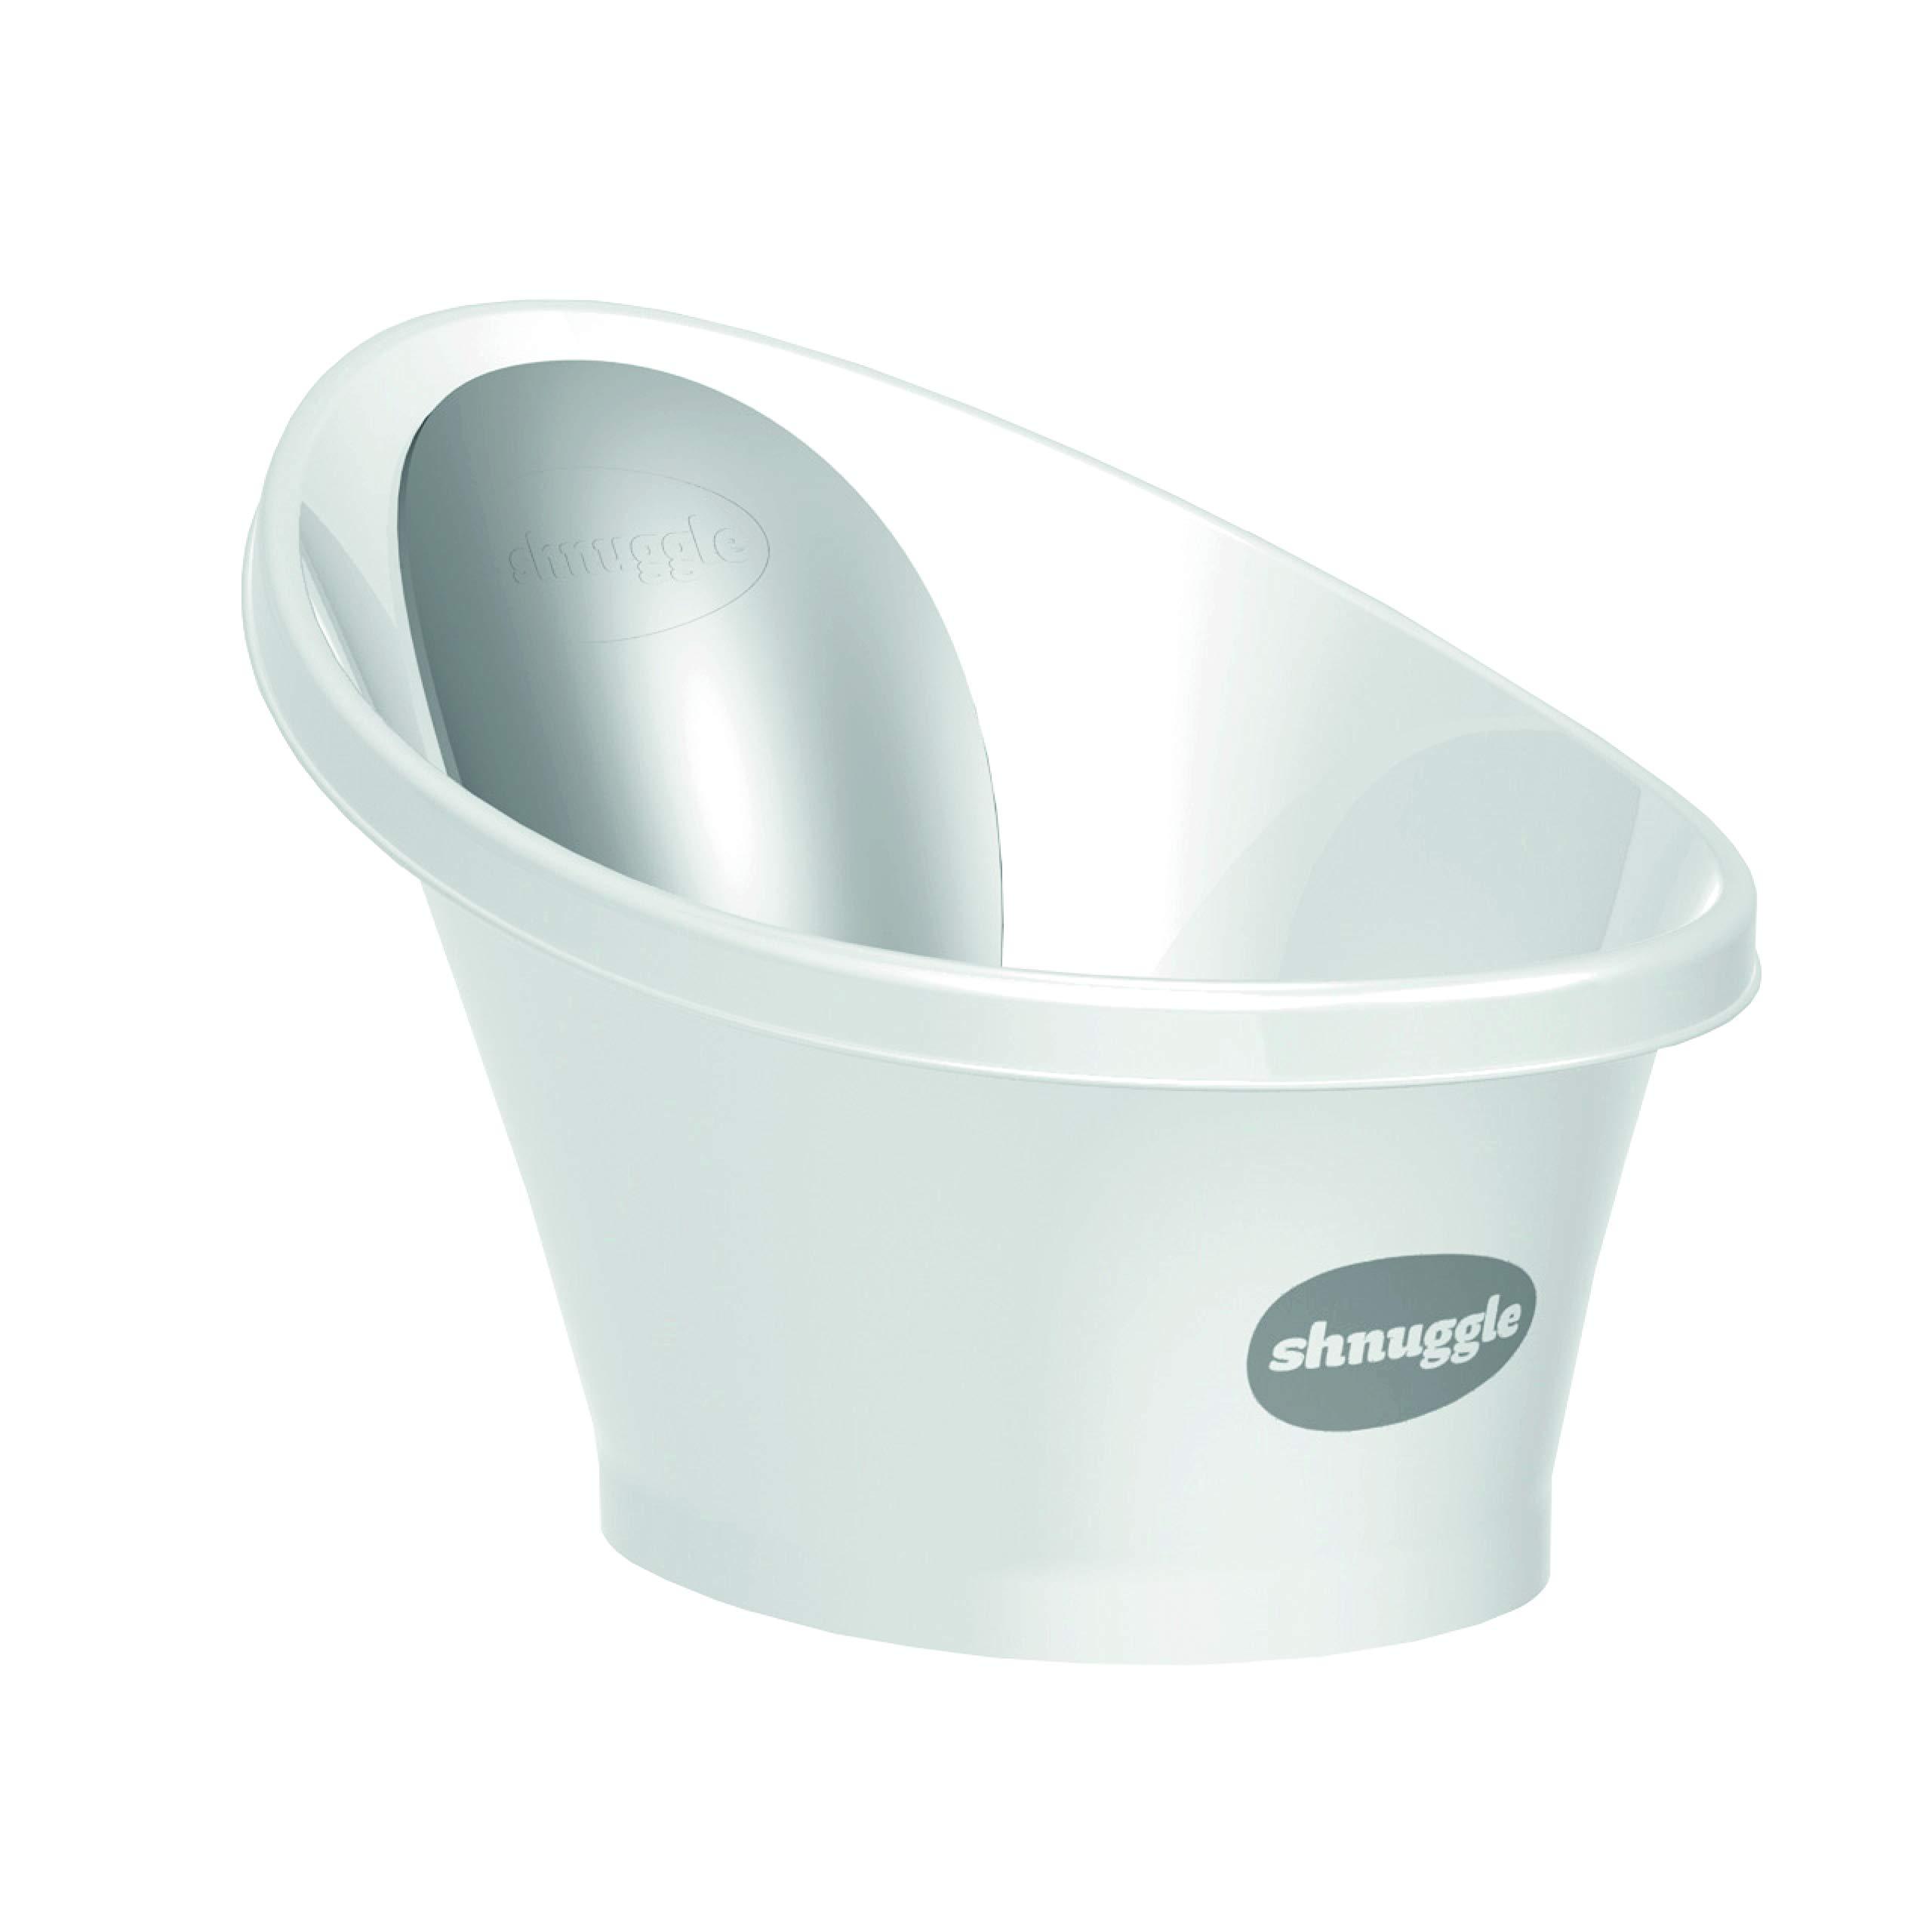 Shnuggle Baby Bath Tub - Compact Support Seat for Newborns, Wash Infants and Make Bath Time Easy, 0-12m, Grey by SHNUGGLE